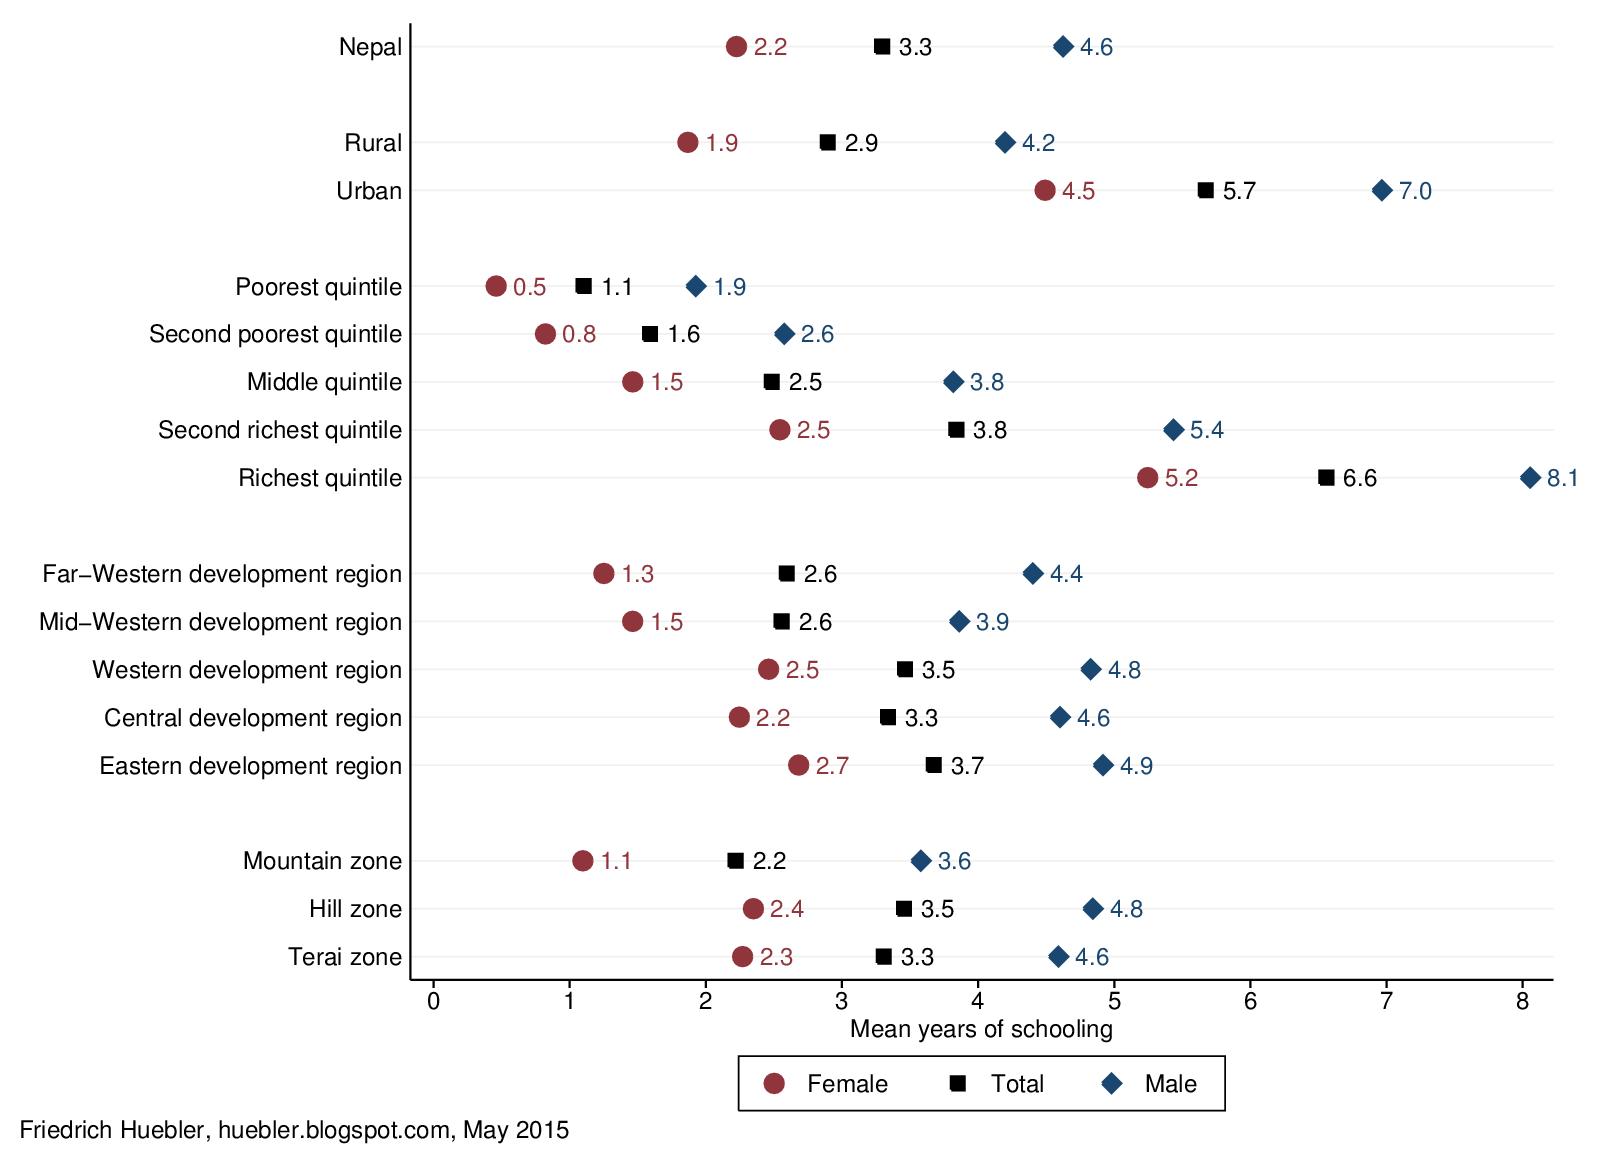 International Education Statistics: Mean years of schooling